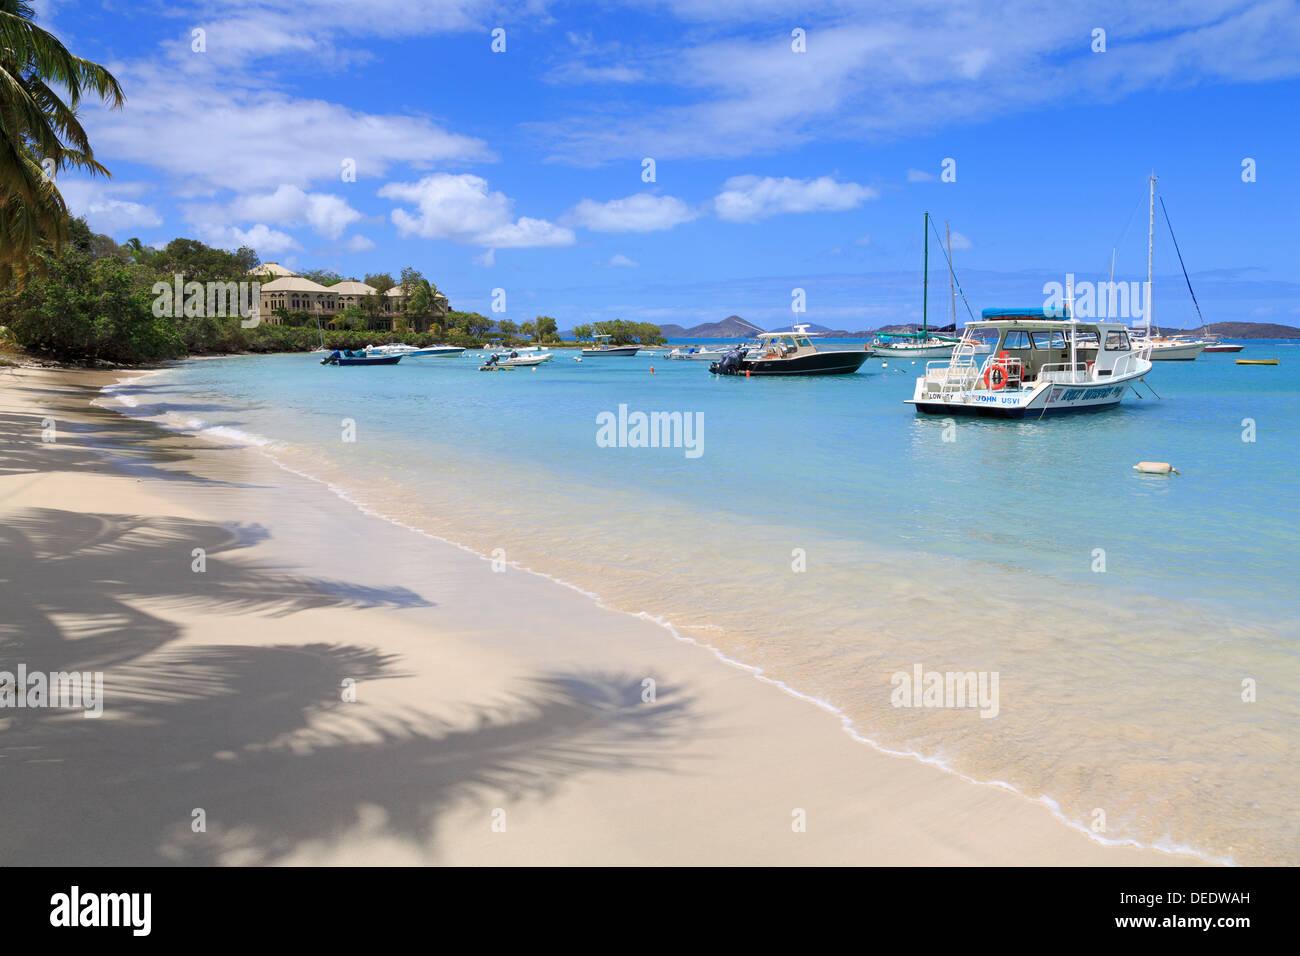 Beach in Cruz Bay, St. John, United States Virgin Islands, West Indies, Caribbean, Central America Stock Photo